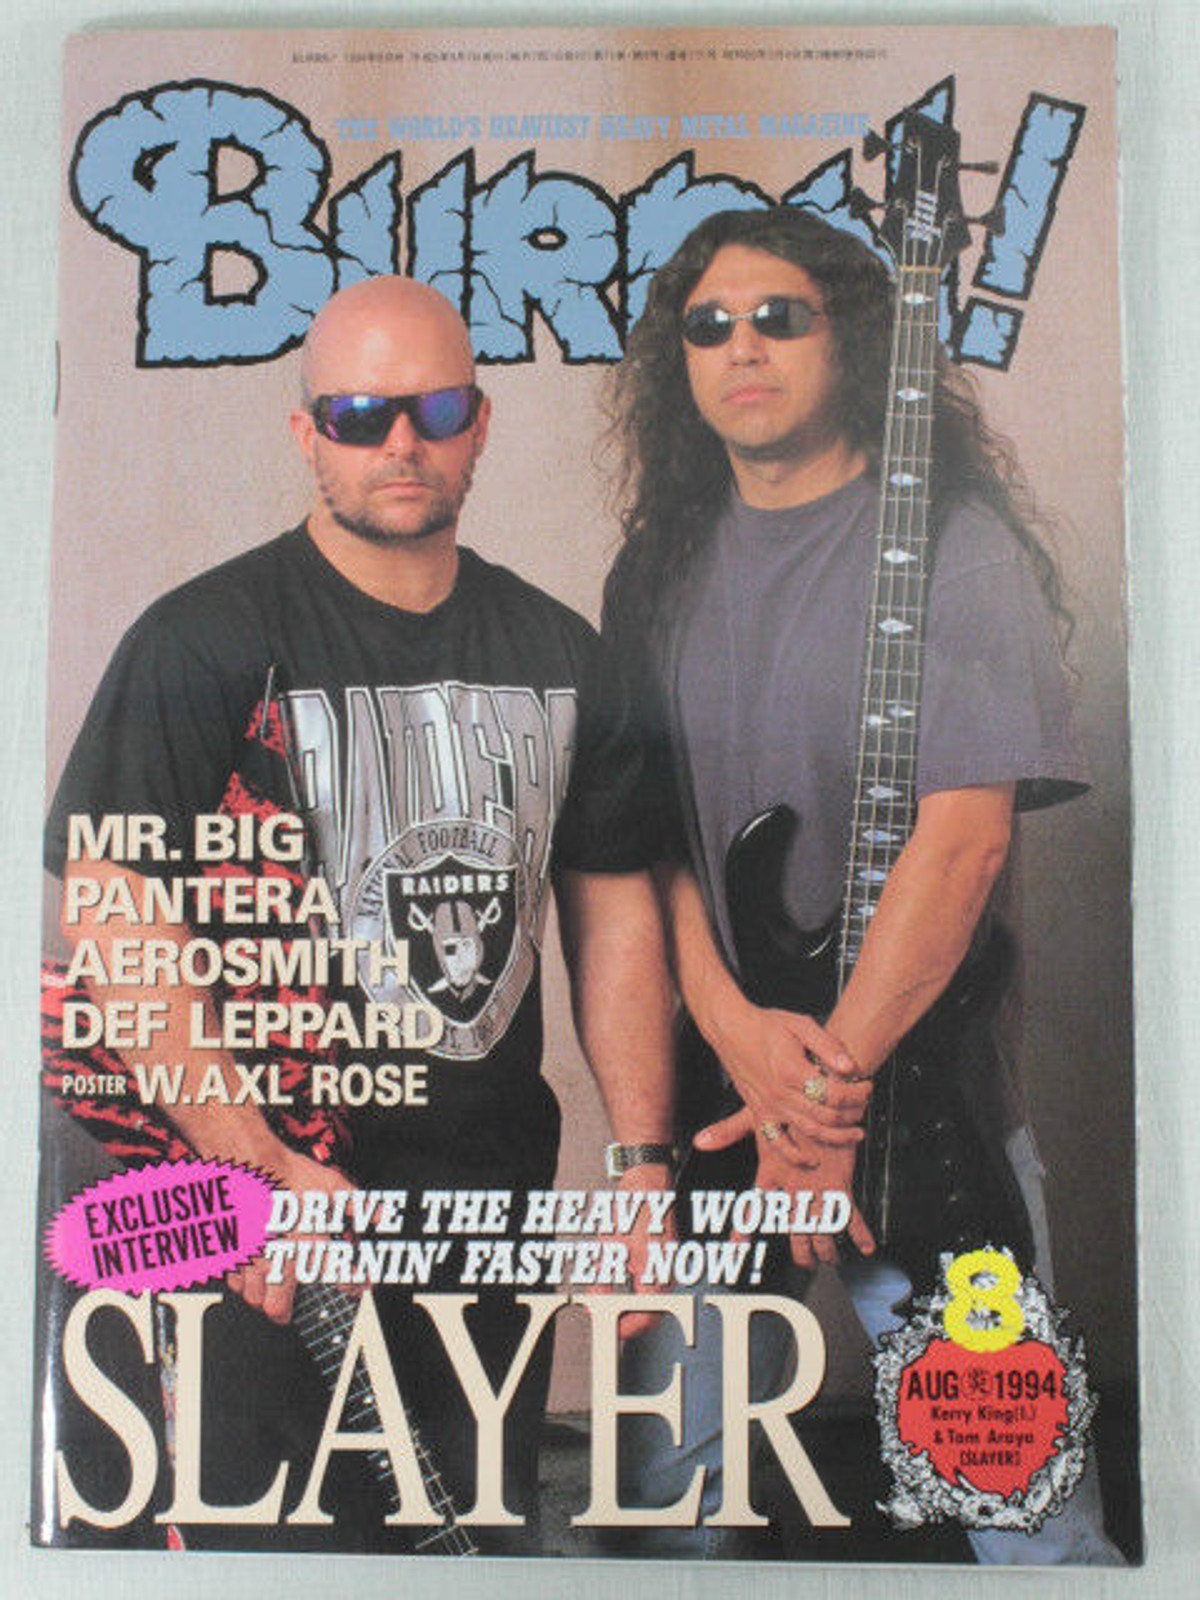 1994/08 BURRN! Japan Rock Magazine SLAYER/MR.BIG/PANTERA/AEROSMITH/HELLOWEEN